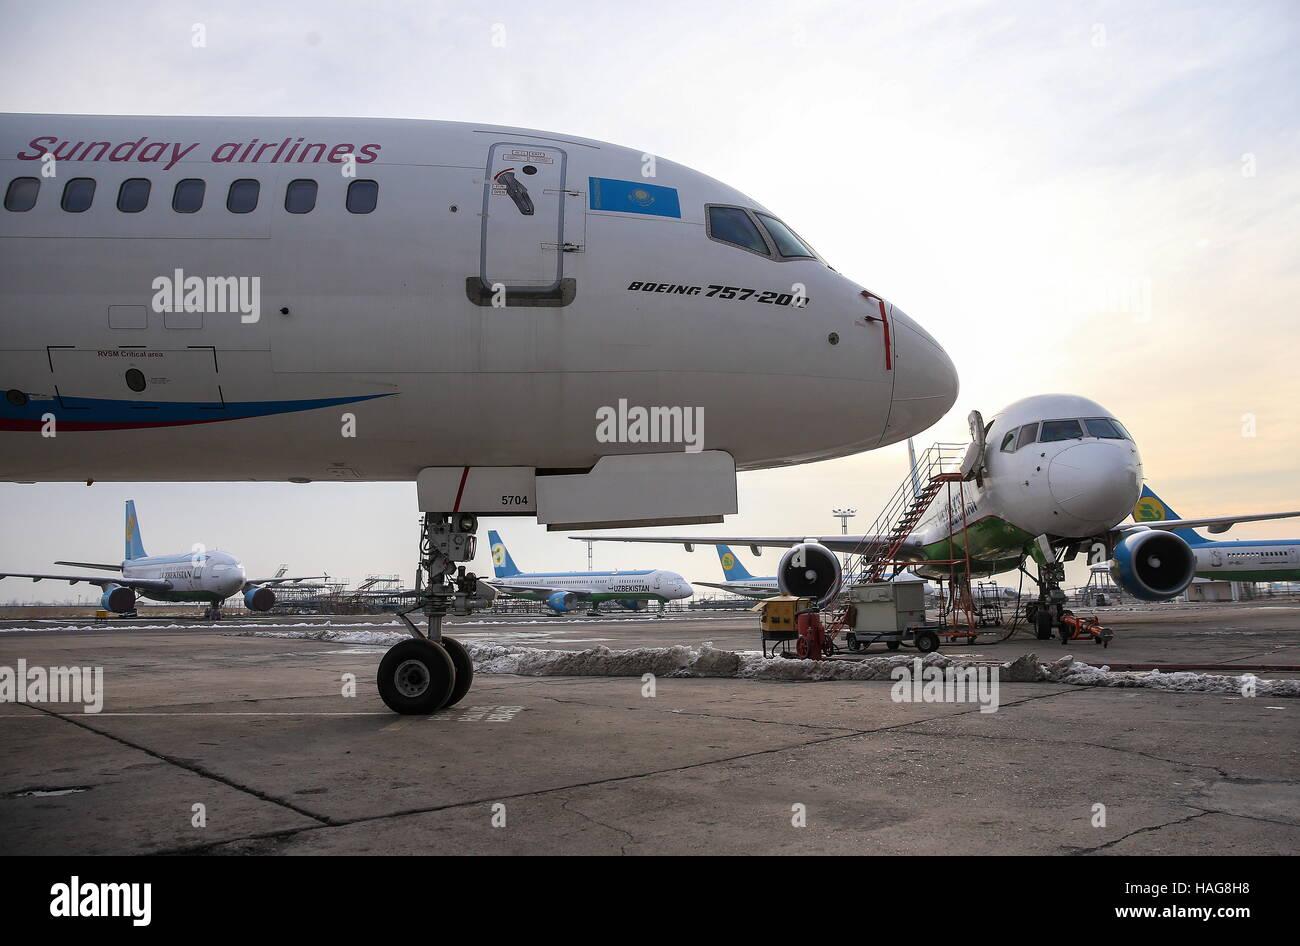 TASHKENT, UZBEKISTAN - NOVEMBER 30, 2016: A Boeing 757-200 passenger  aircraft